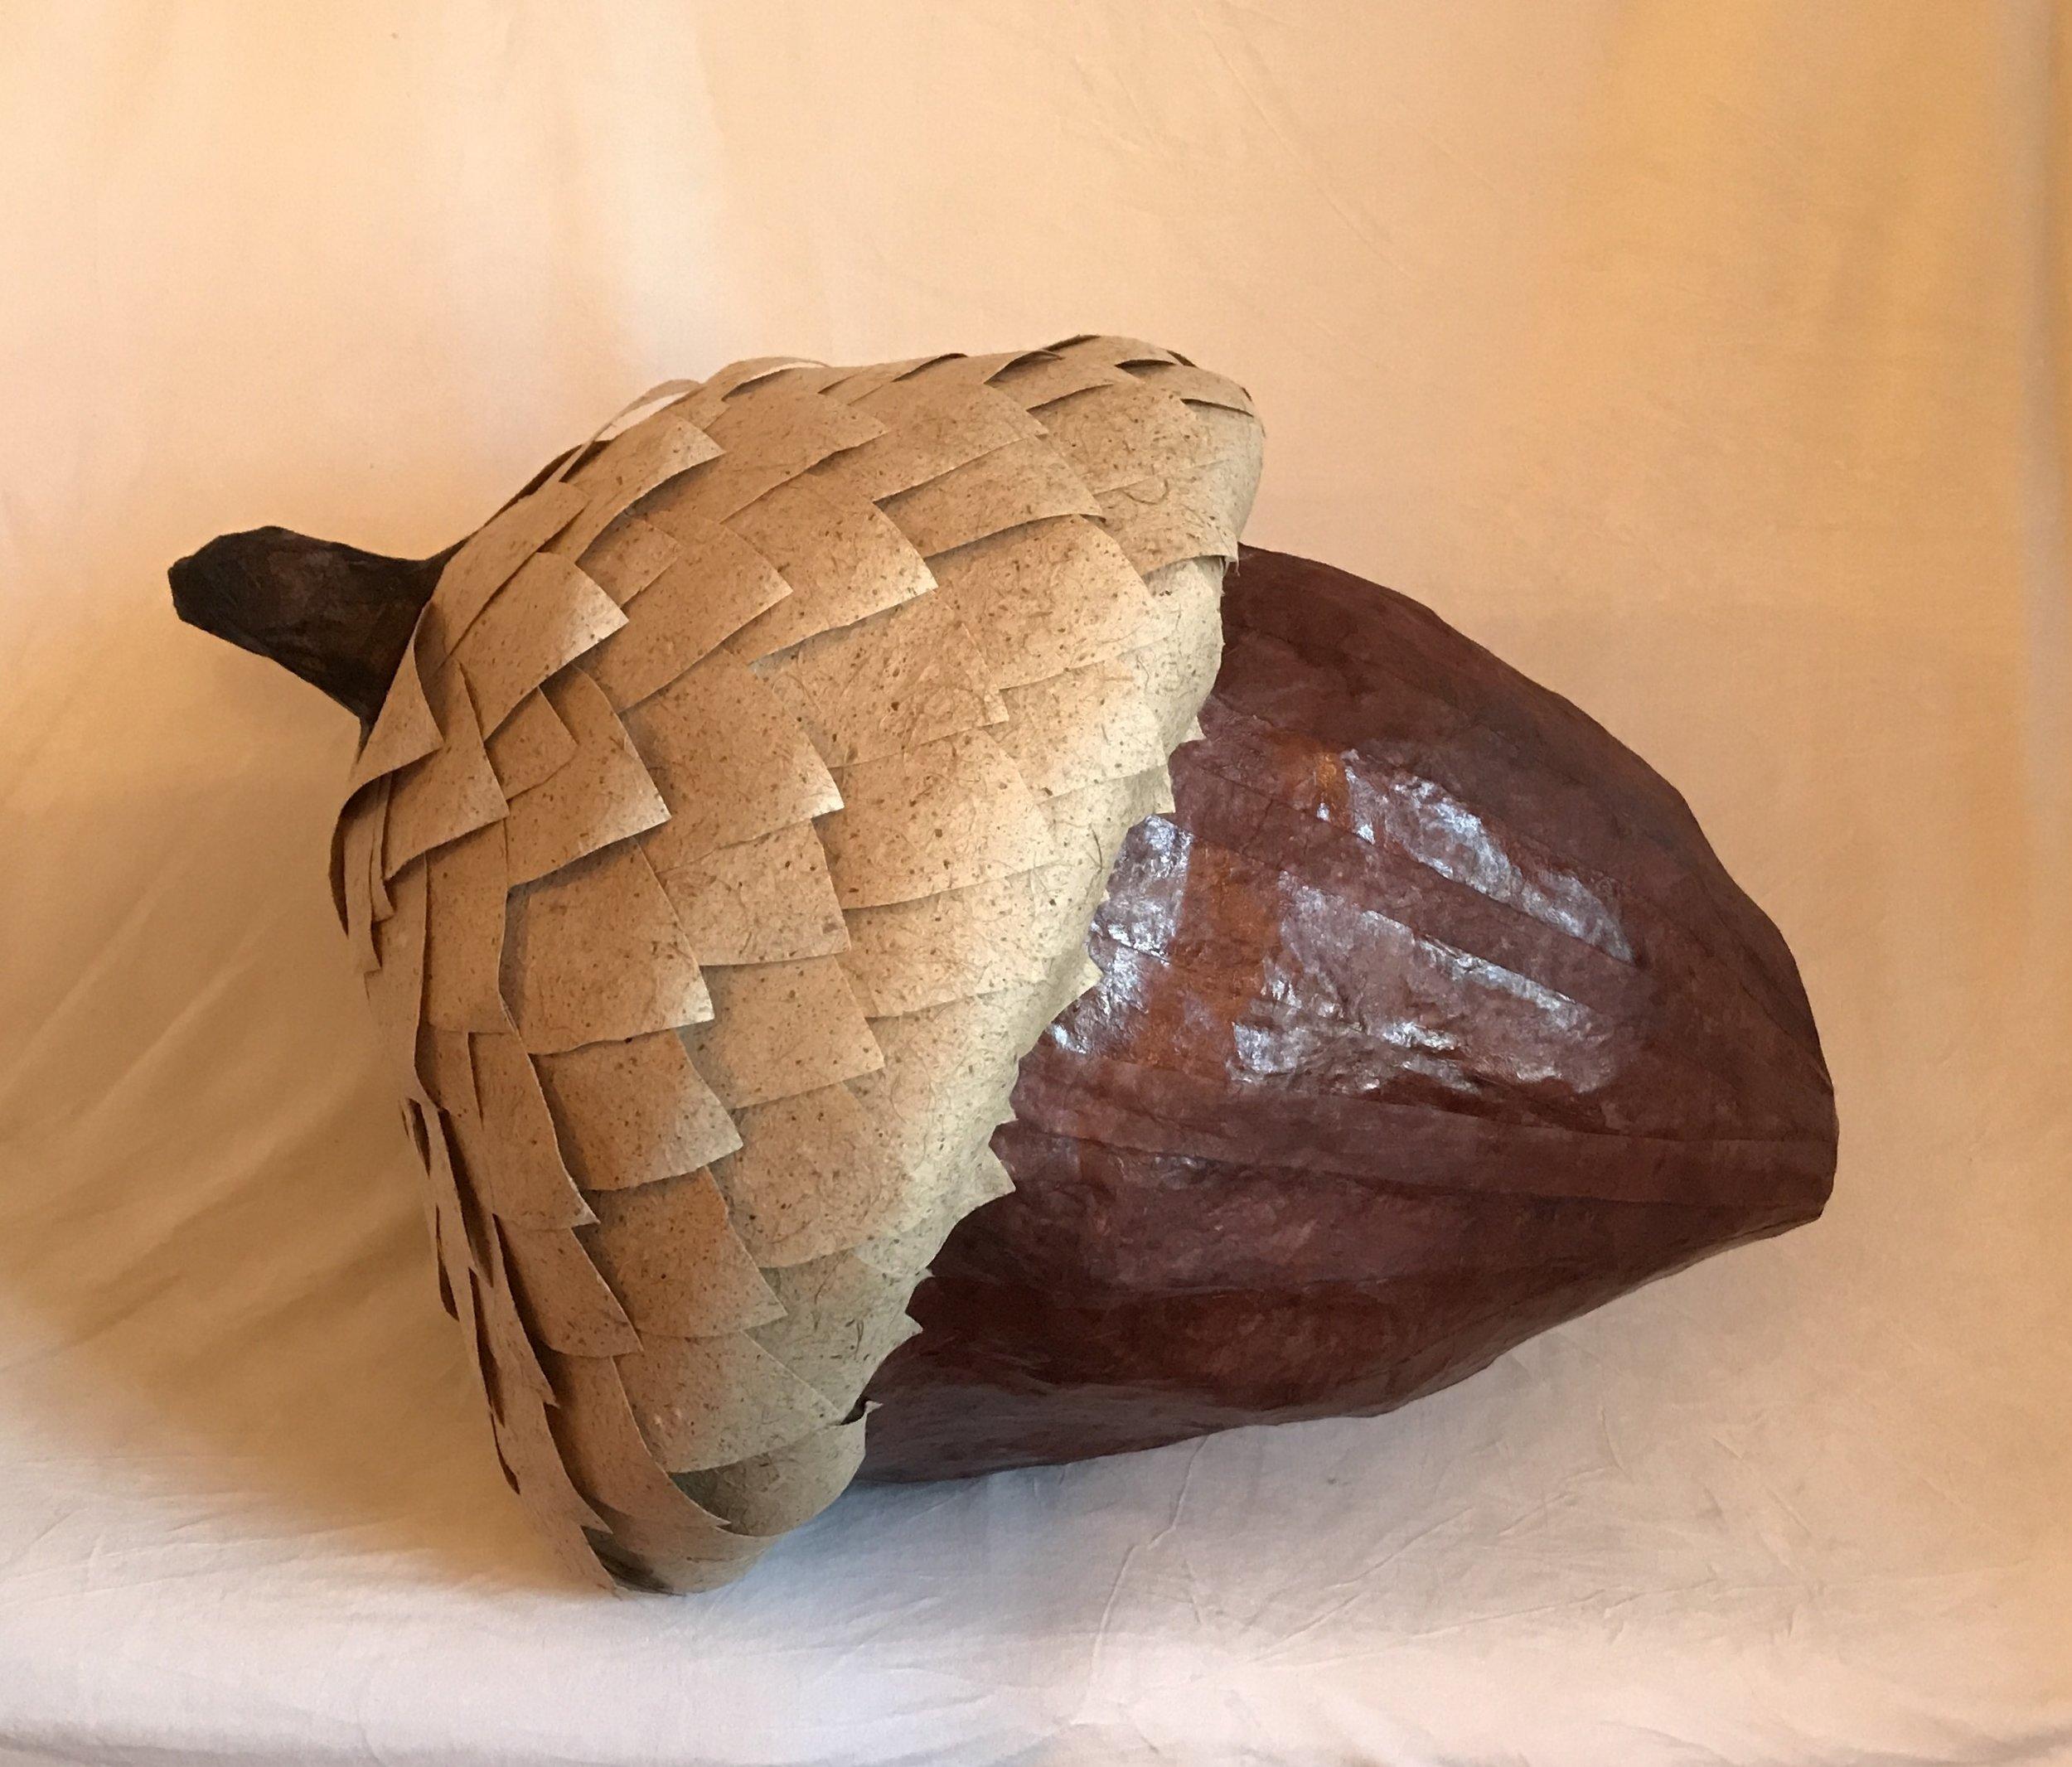 acorn close up.jpg